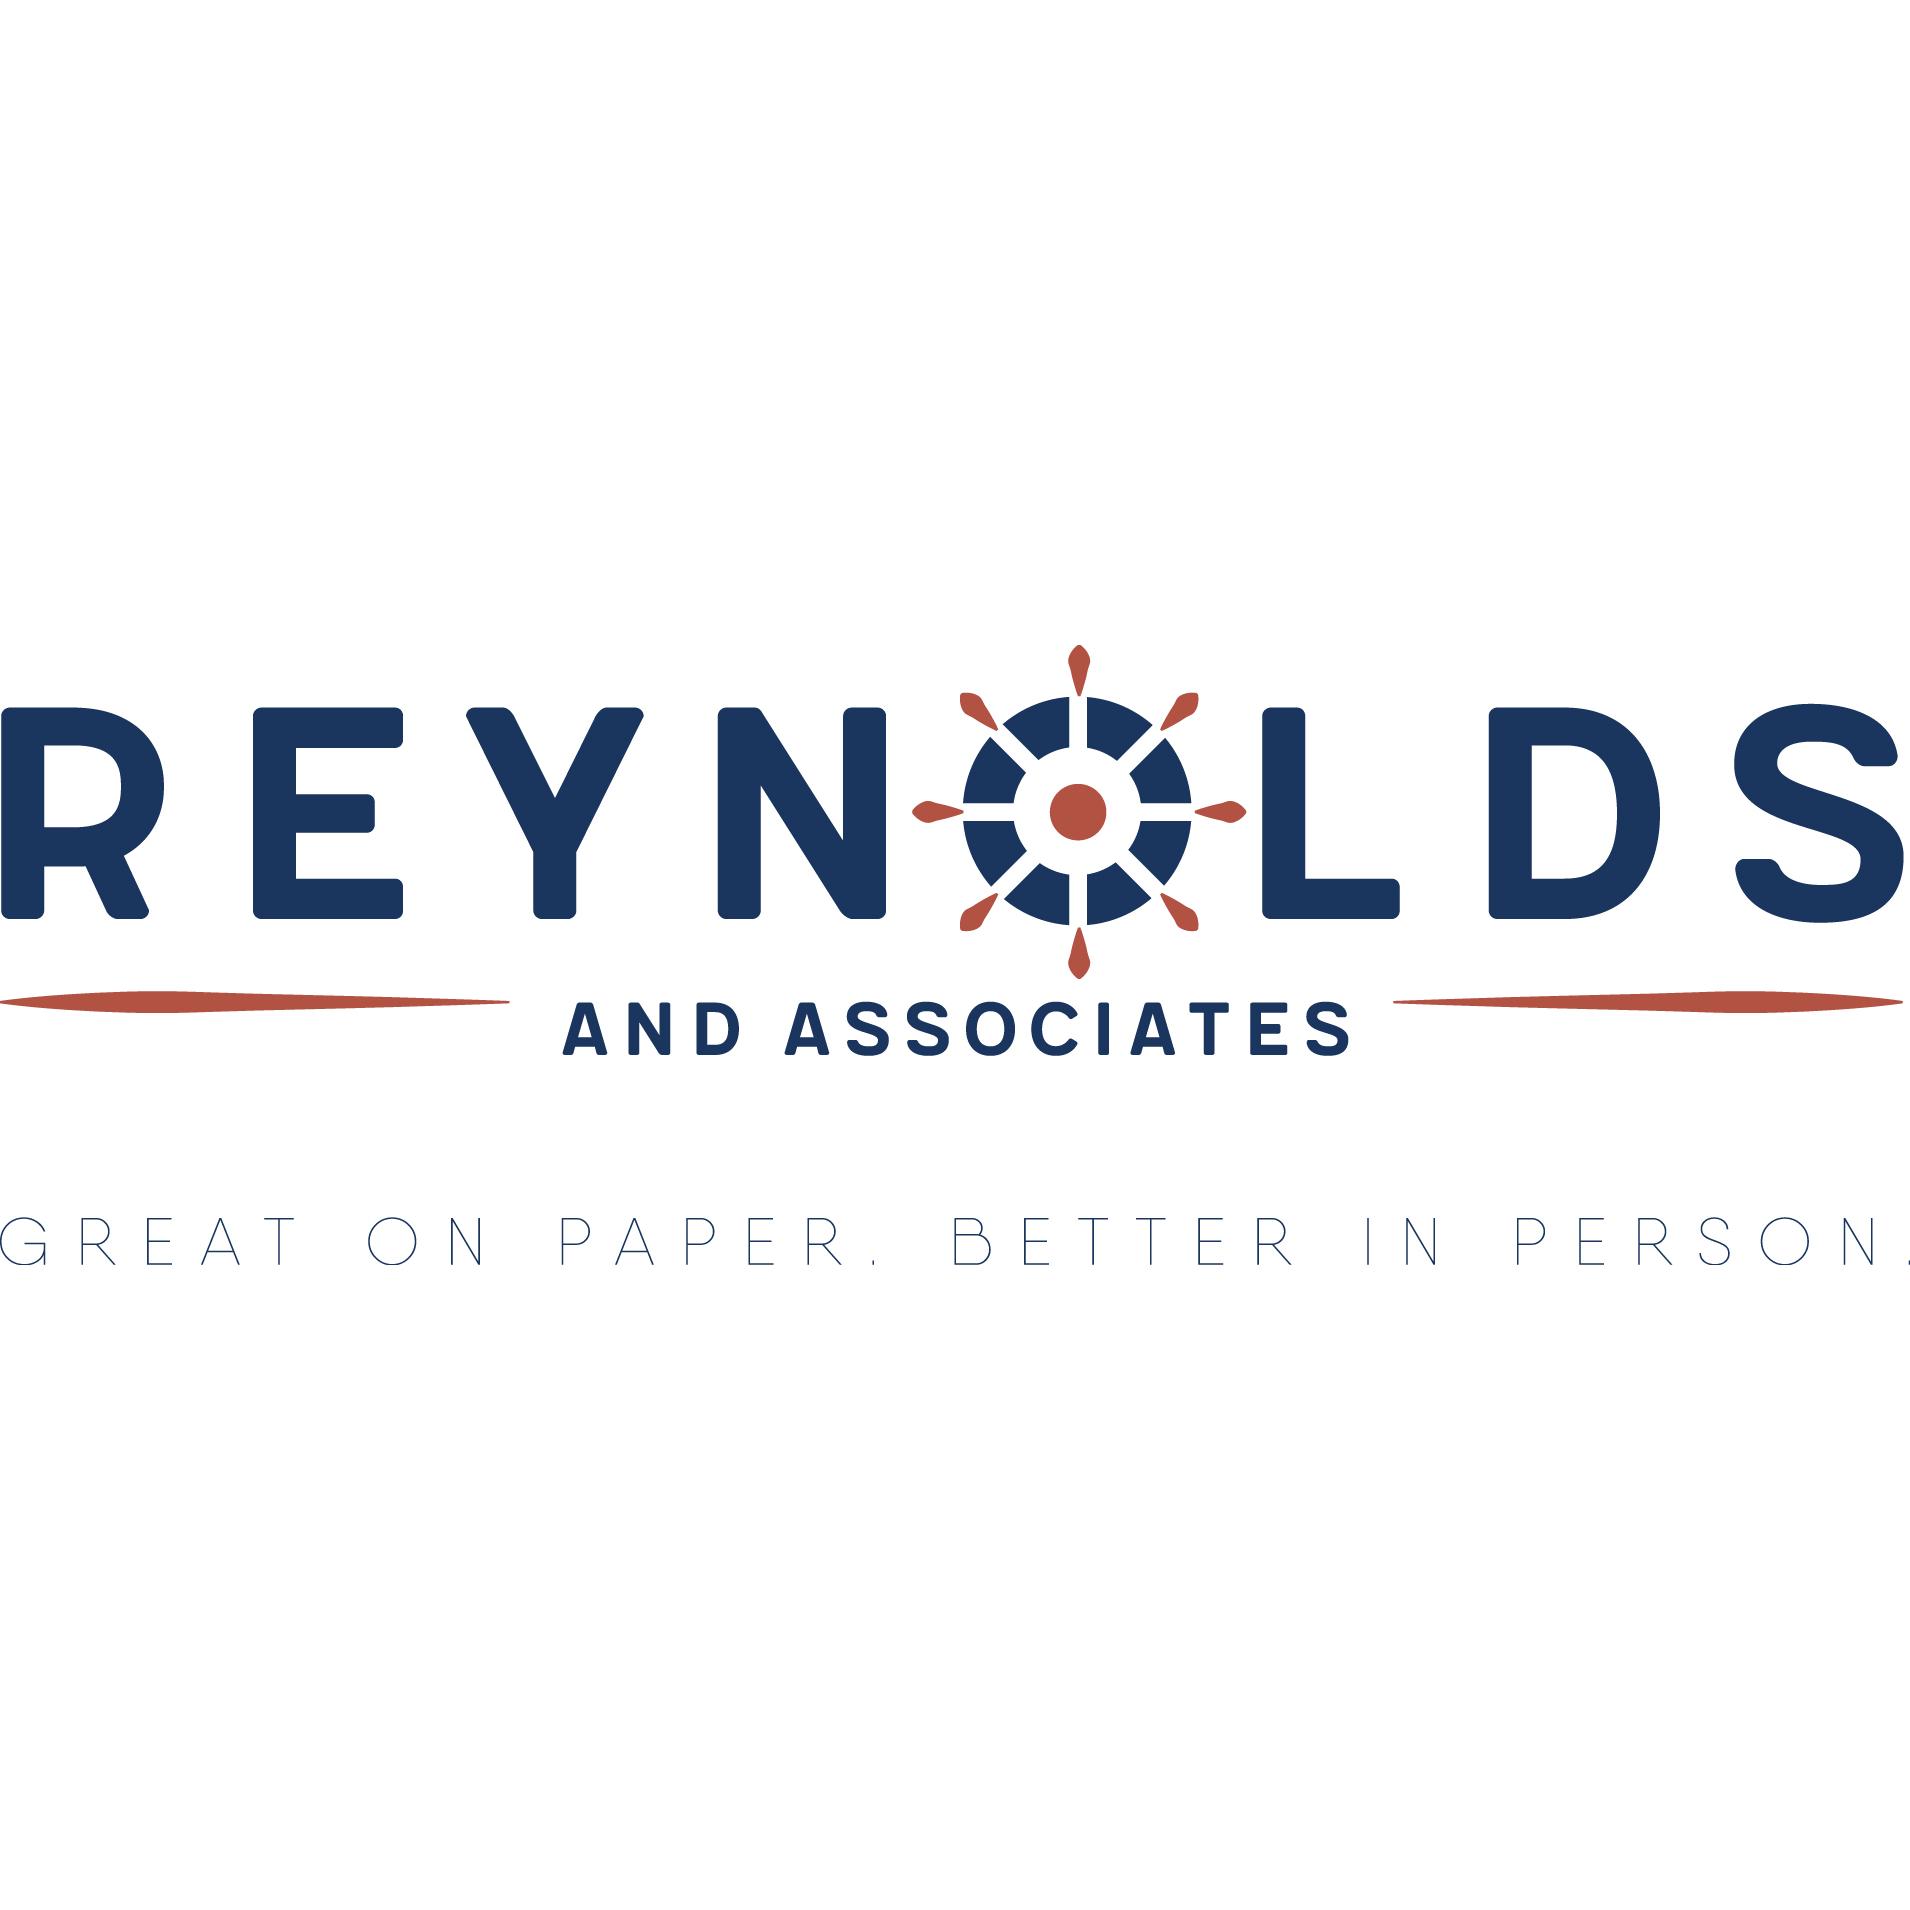 Reynolds & Assoc